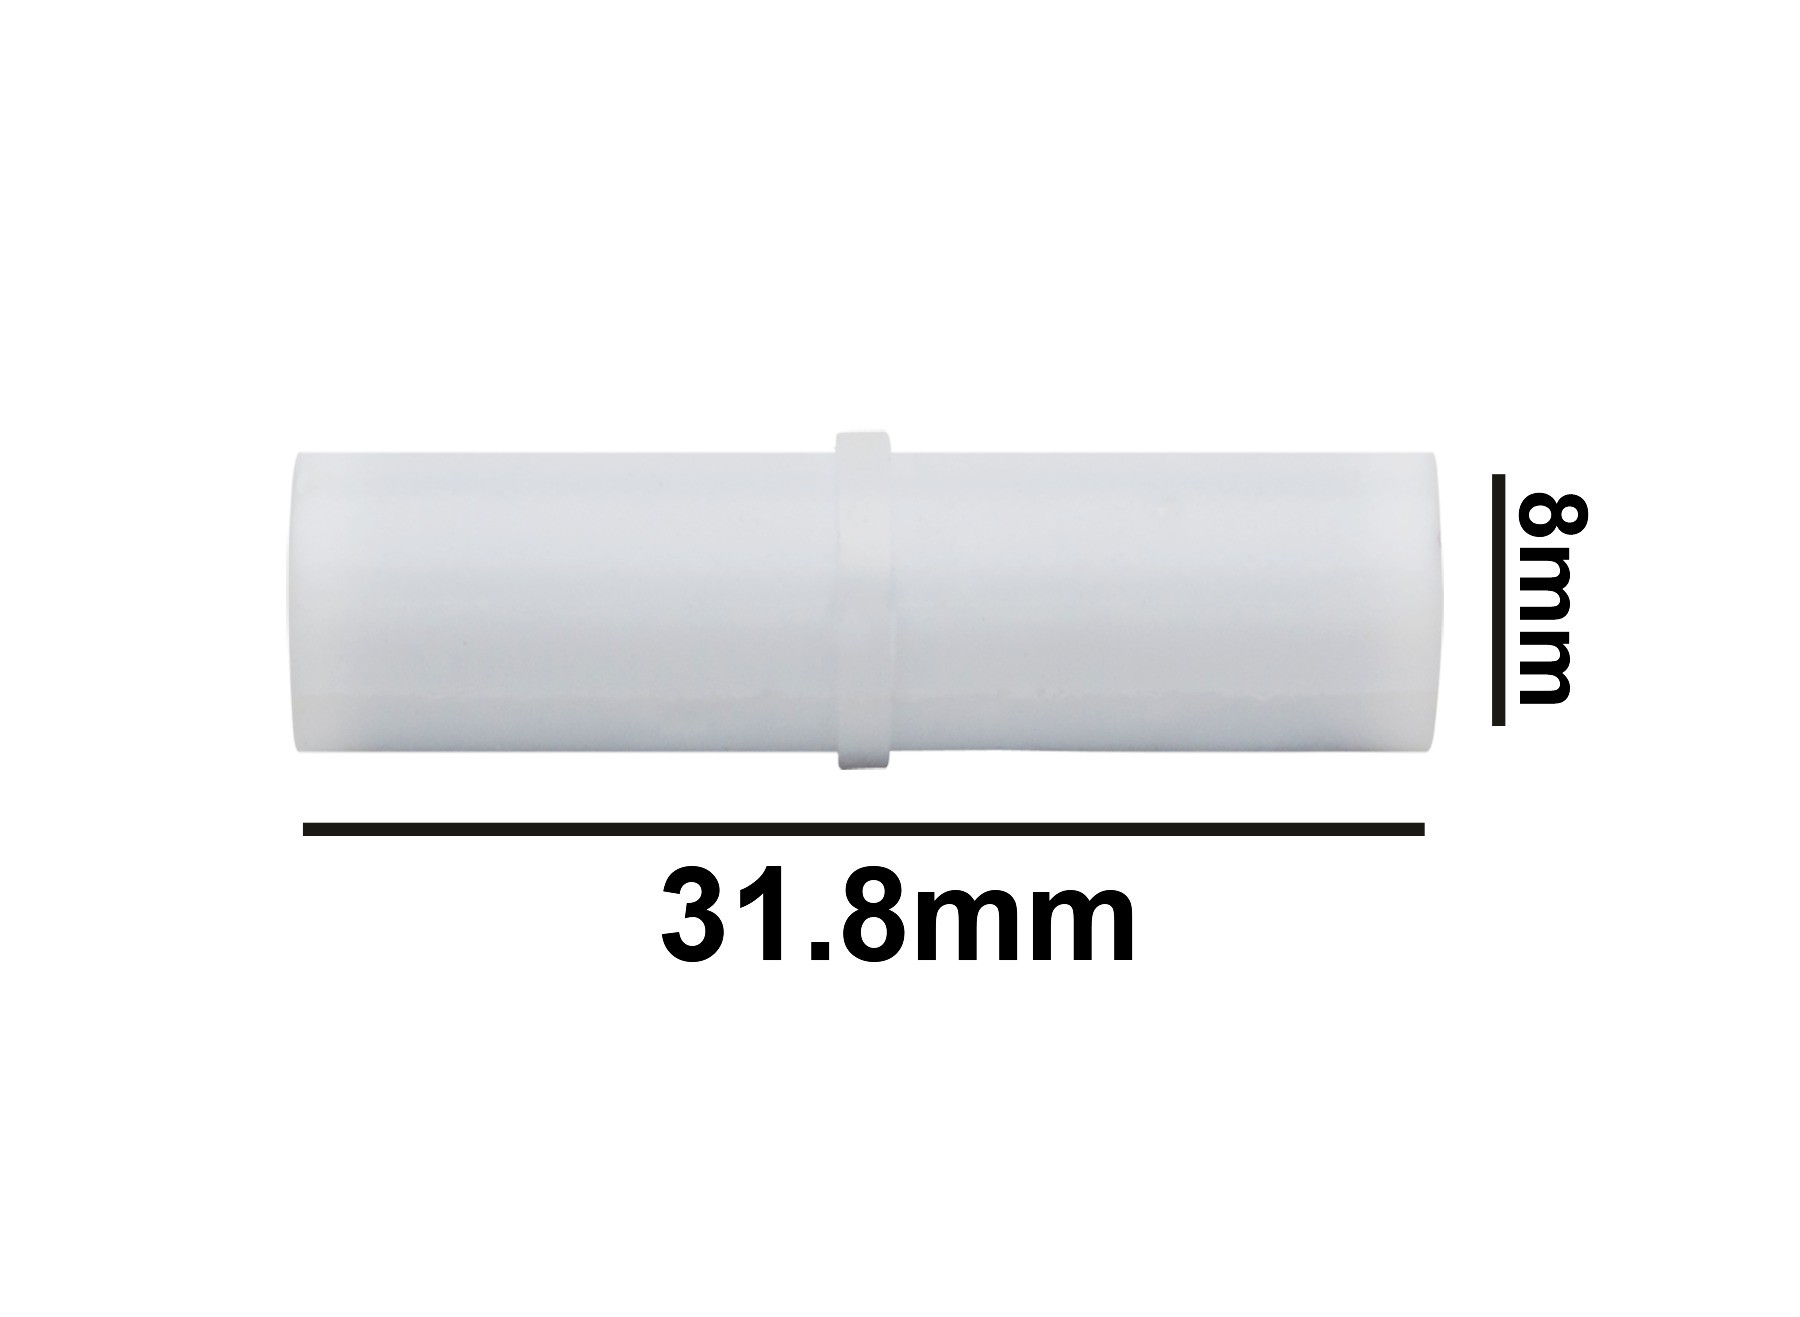 SP Bel-Art Spinbar Teflon Cylindrical Magnetic Stirring Bar; 31.8 x 8mm, White